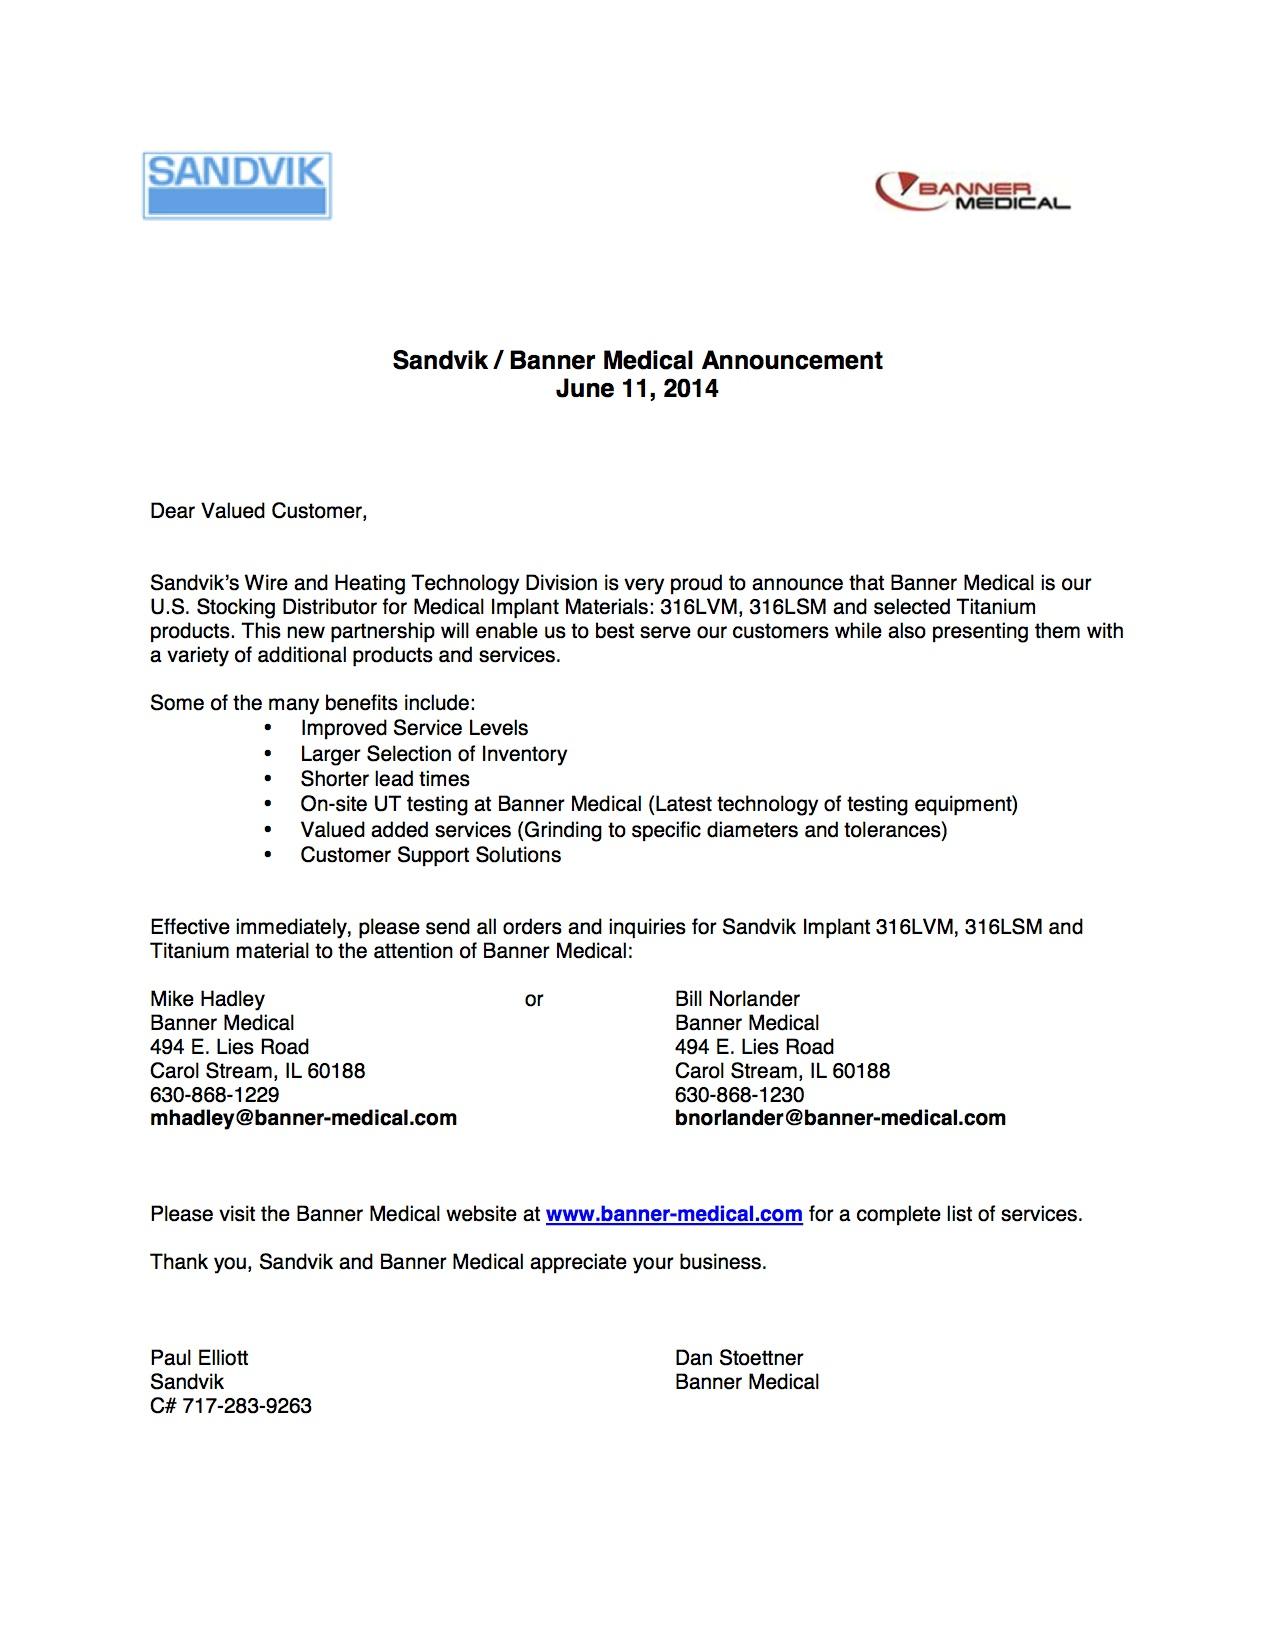 Sandvik® and Banner Medical Announce U.S. Stocking Distributor Partnership for 316LVM, 316 LSM, and Select Titanium Grade Materials